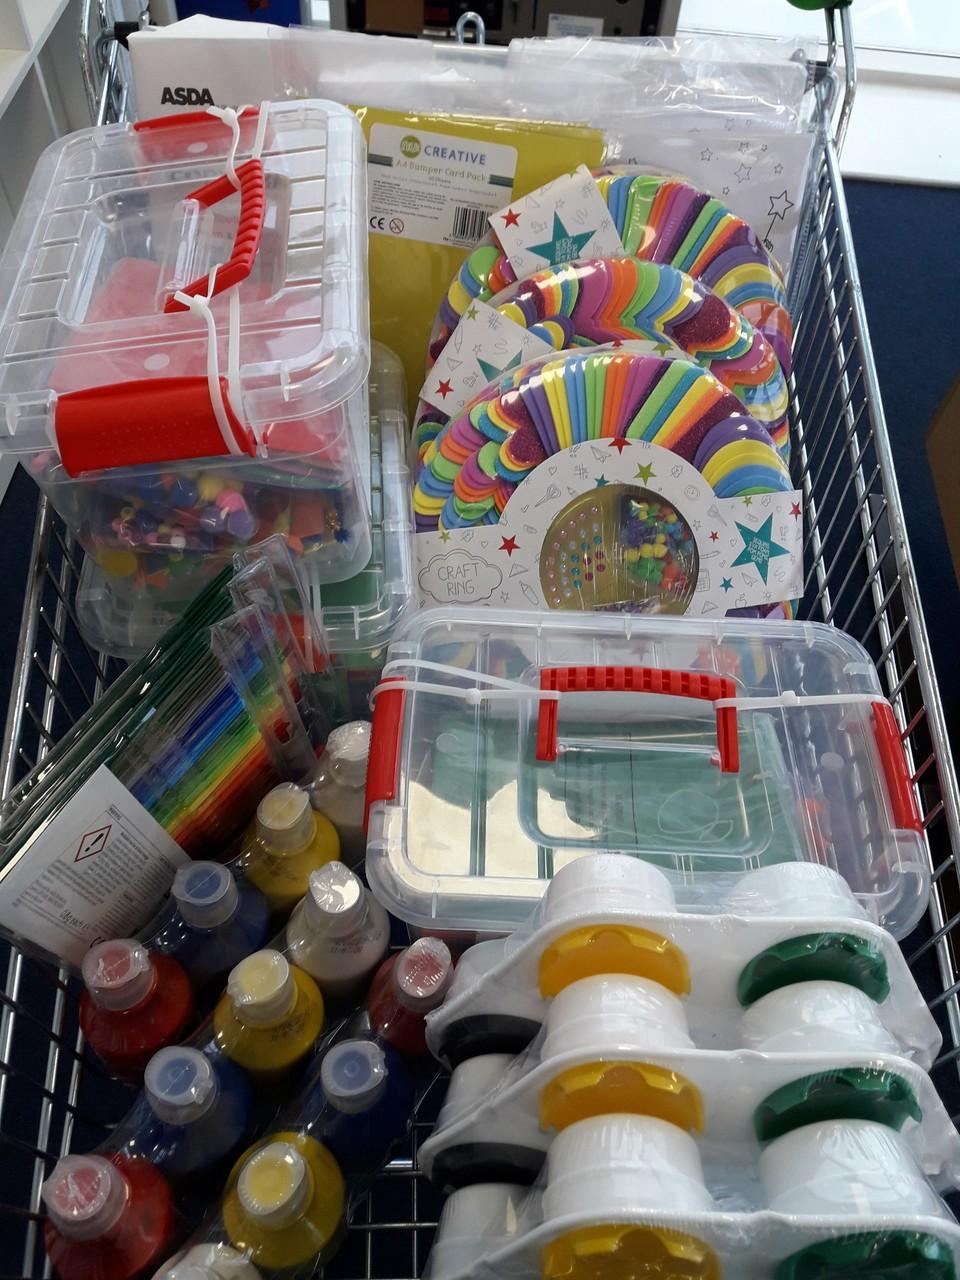 Donation forWinlaton Community Centre | Asda Gateshead